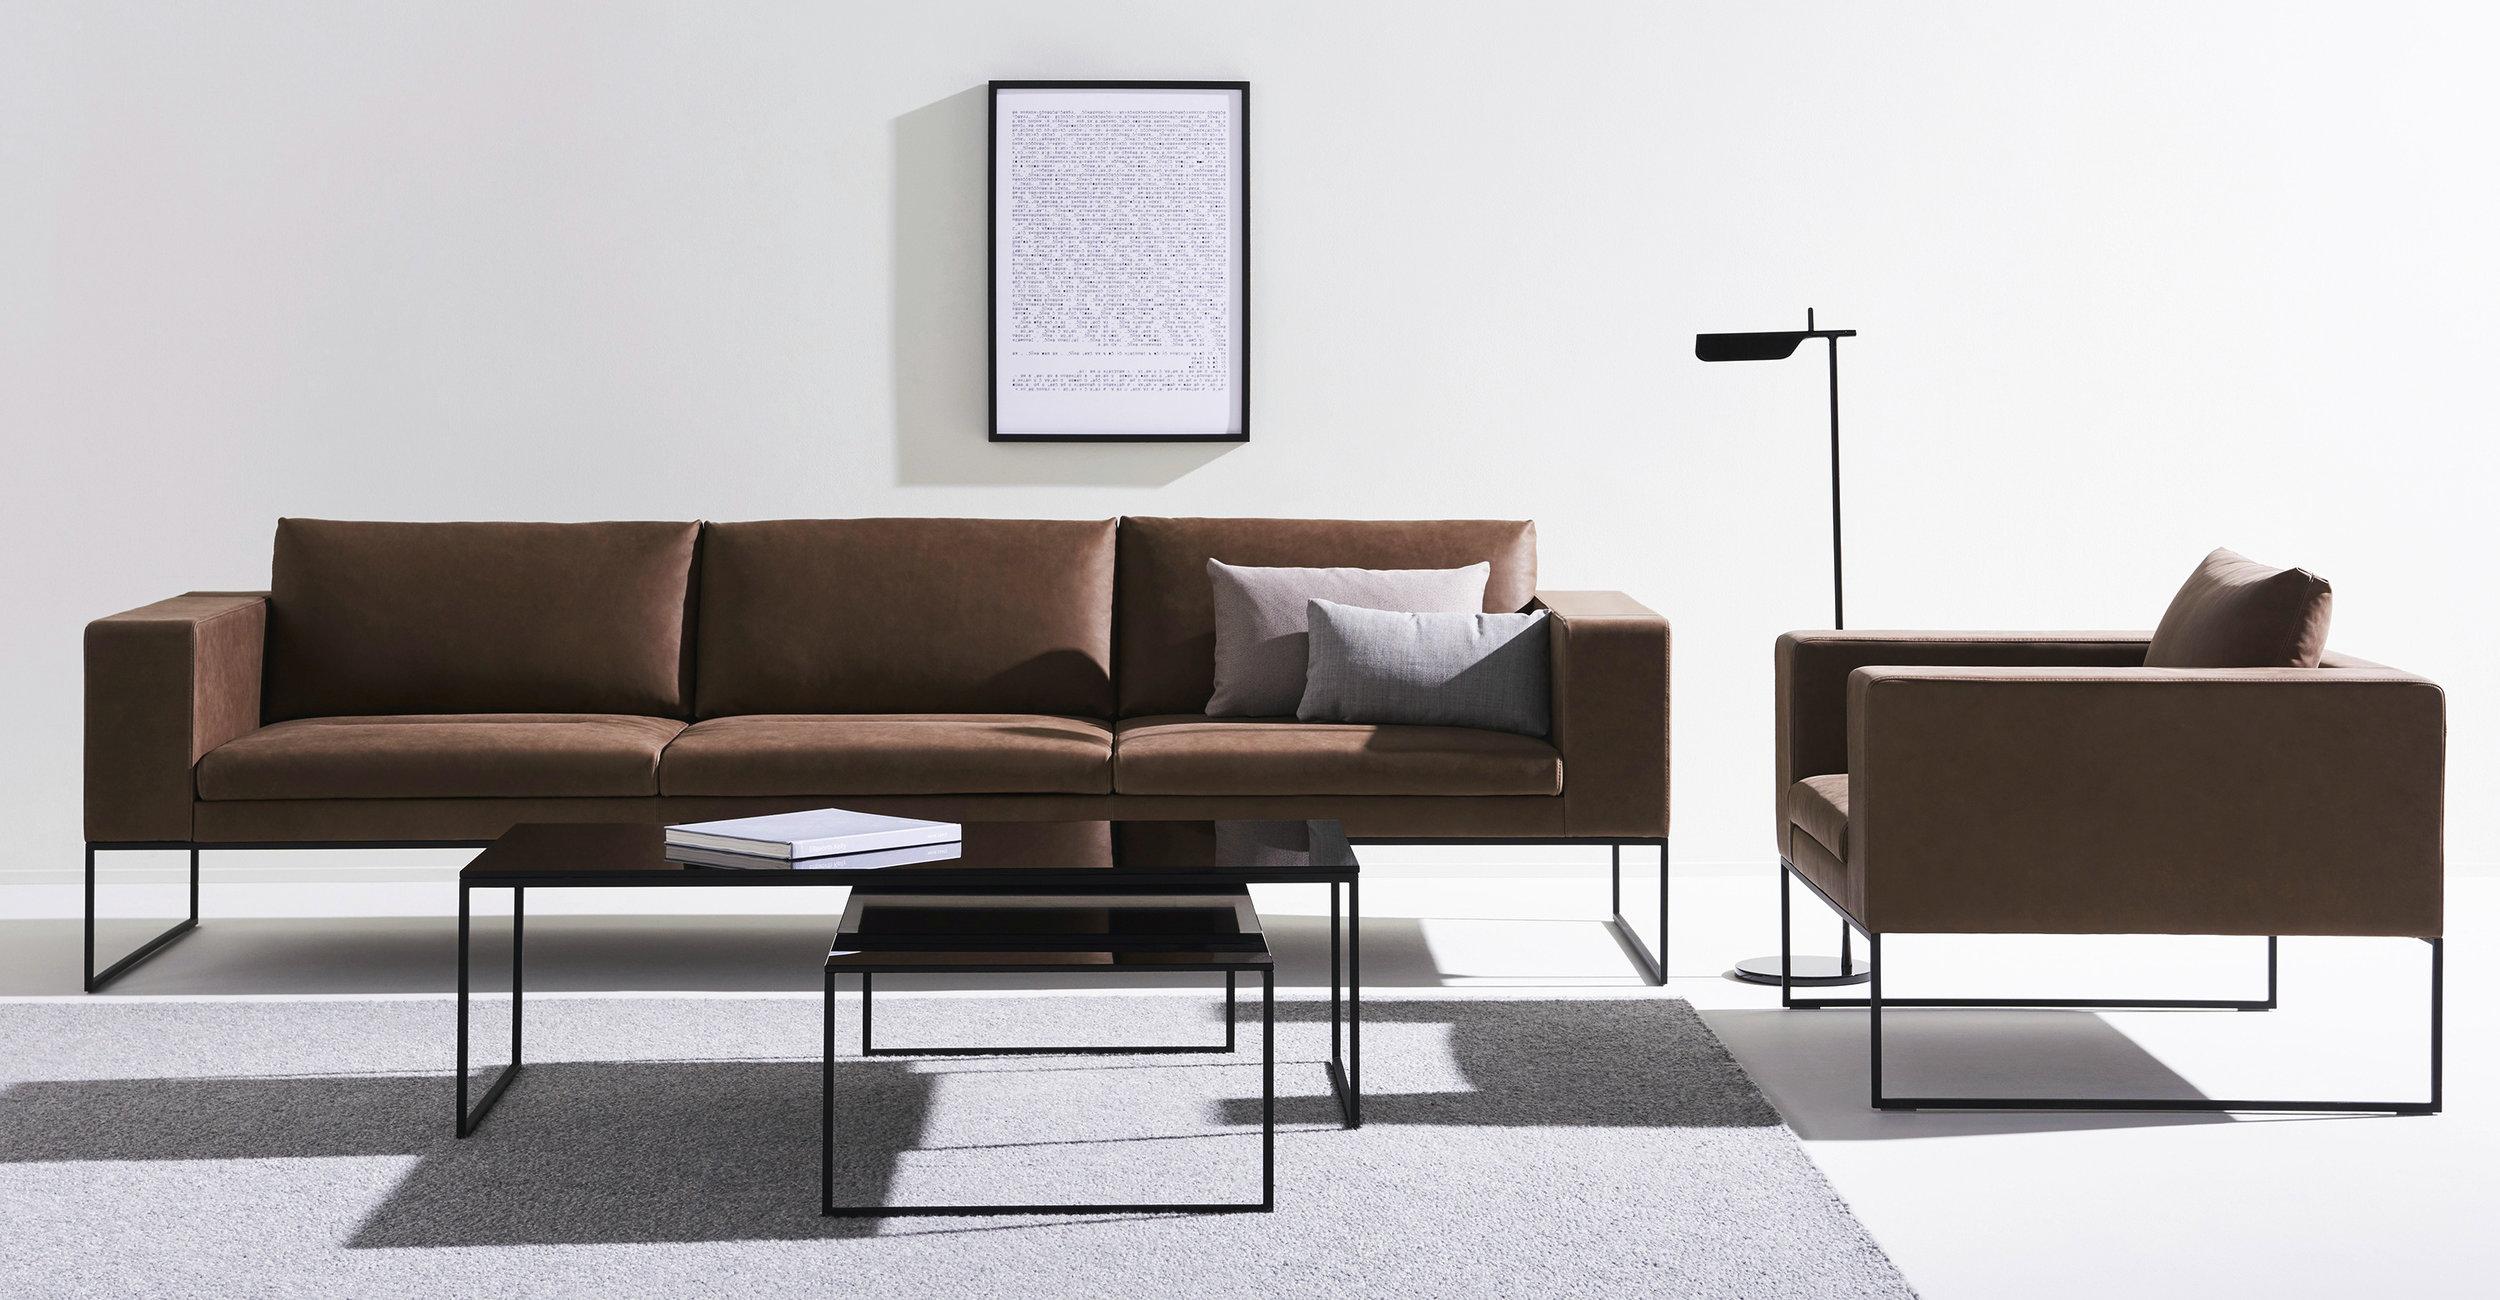 Nora-Lounge-Collection-Rebecca-Goddard-Davis-Furniture (4).jpg